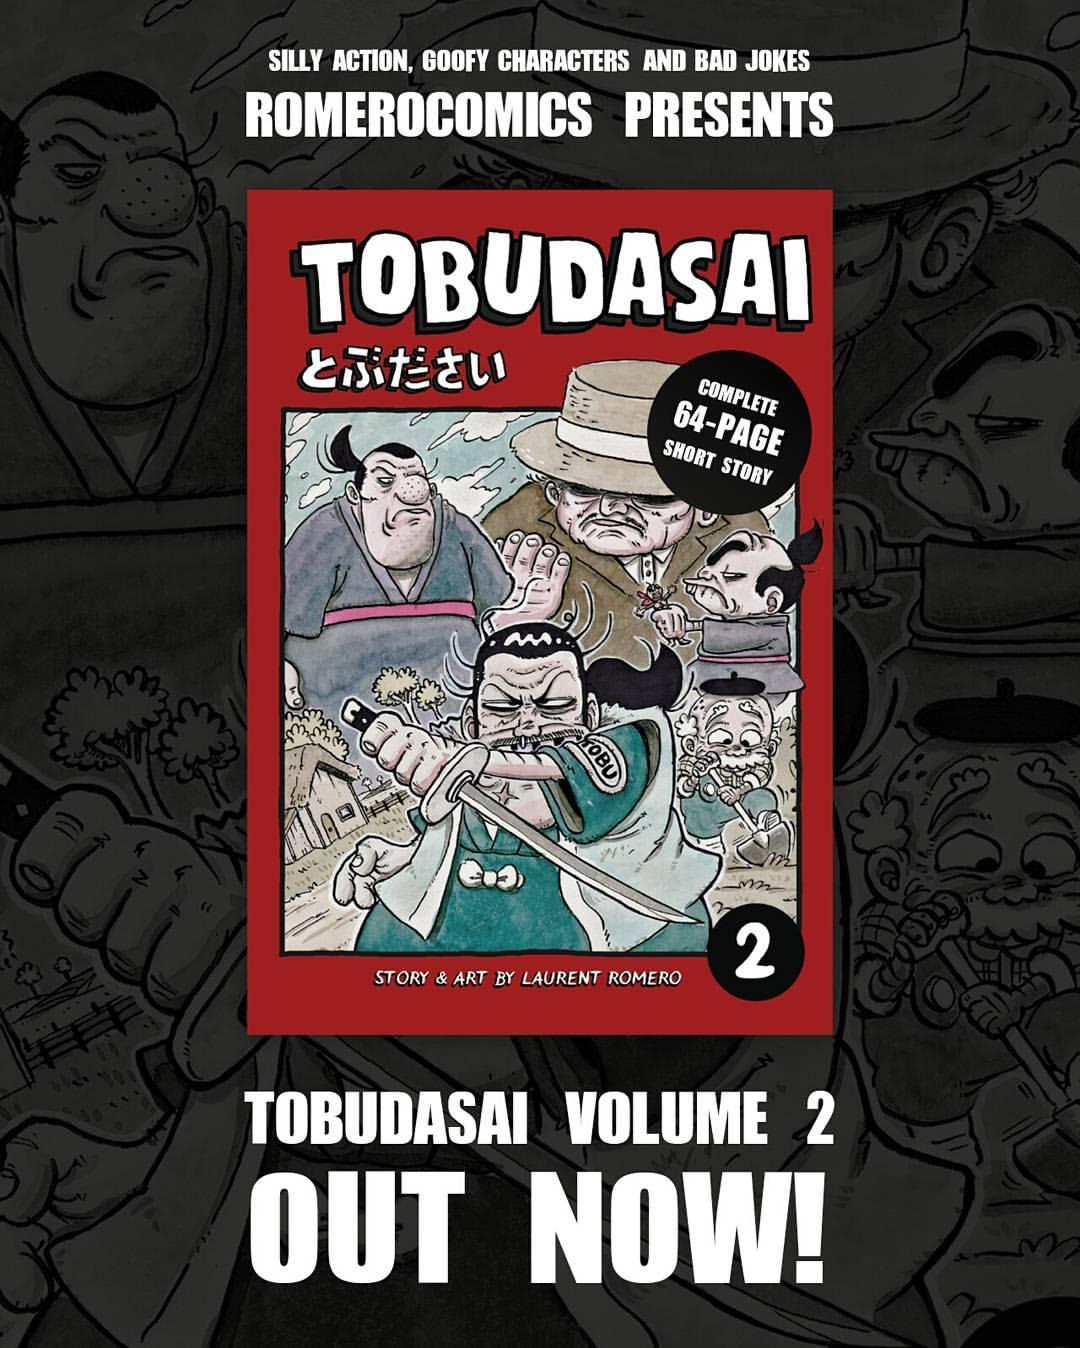 Tobu vol 2 promo